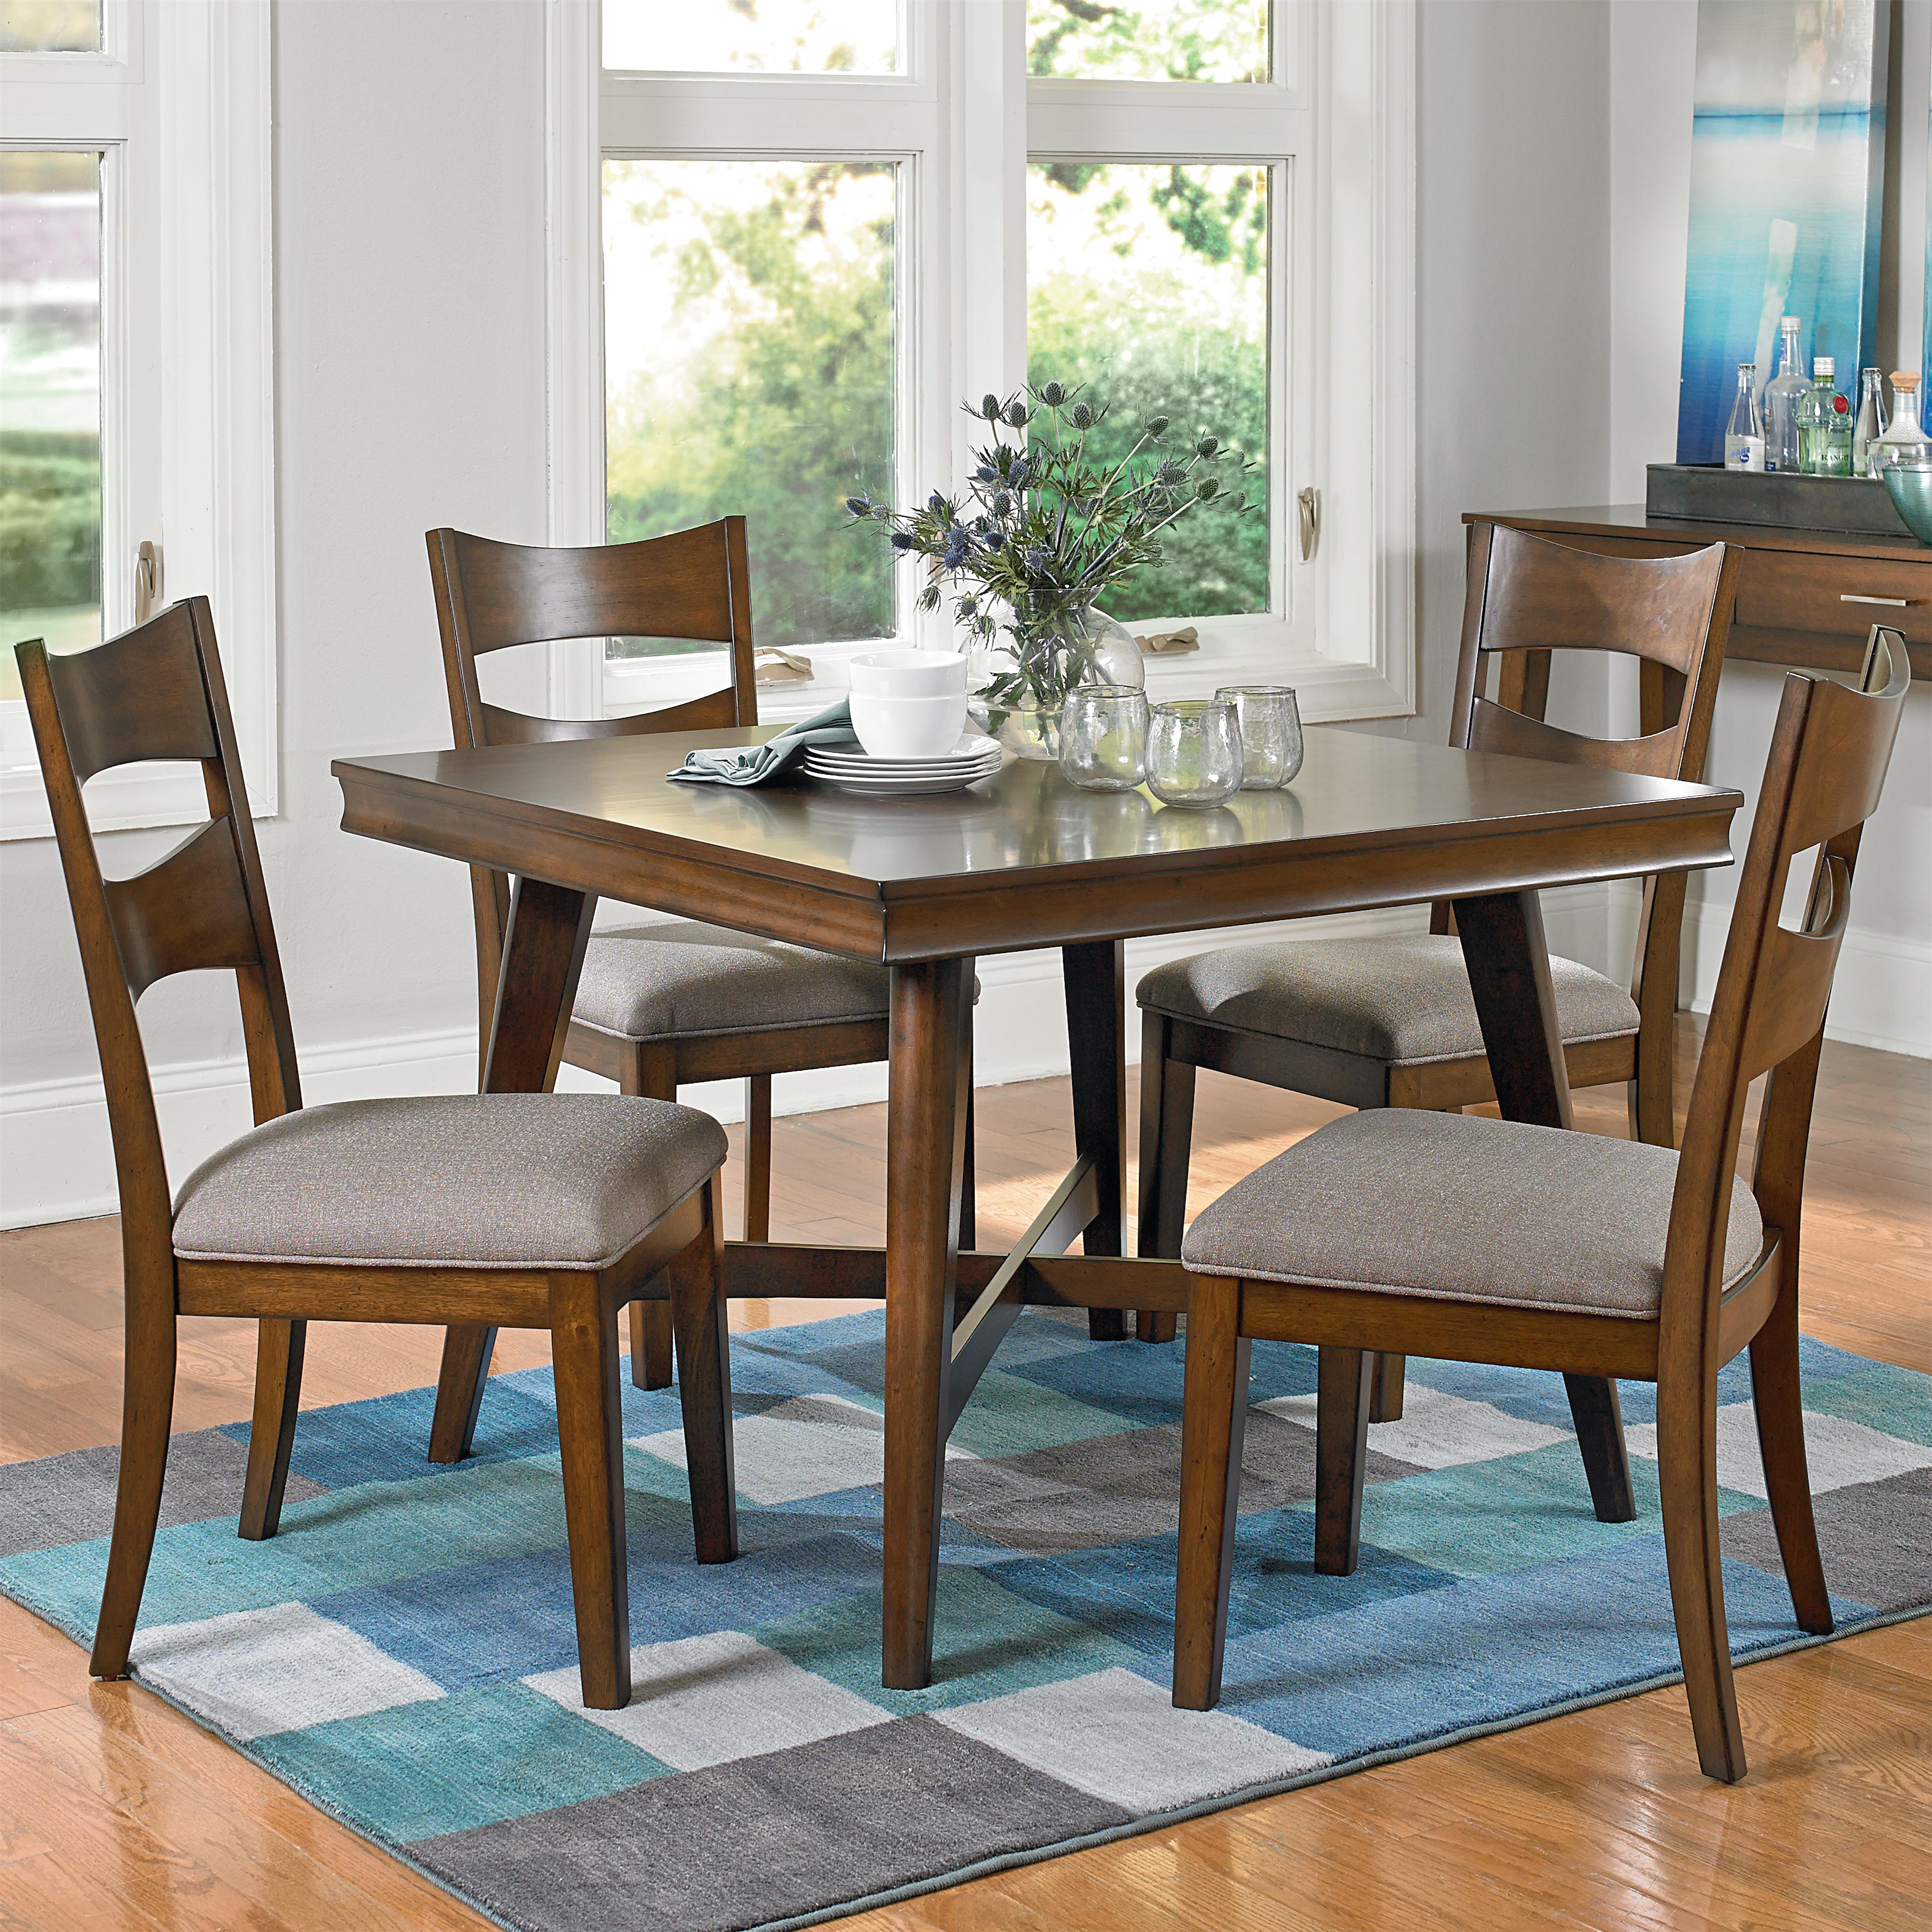 Standard Furniture Miranda Table and Chair Set              - Item Number: 13642